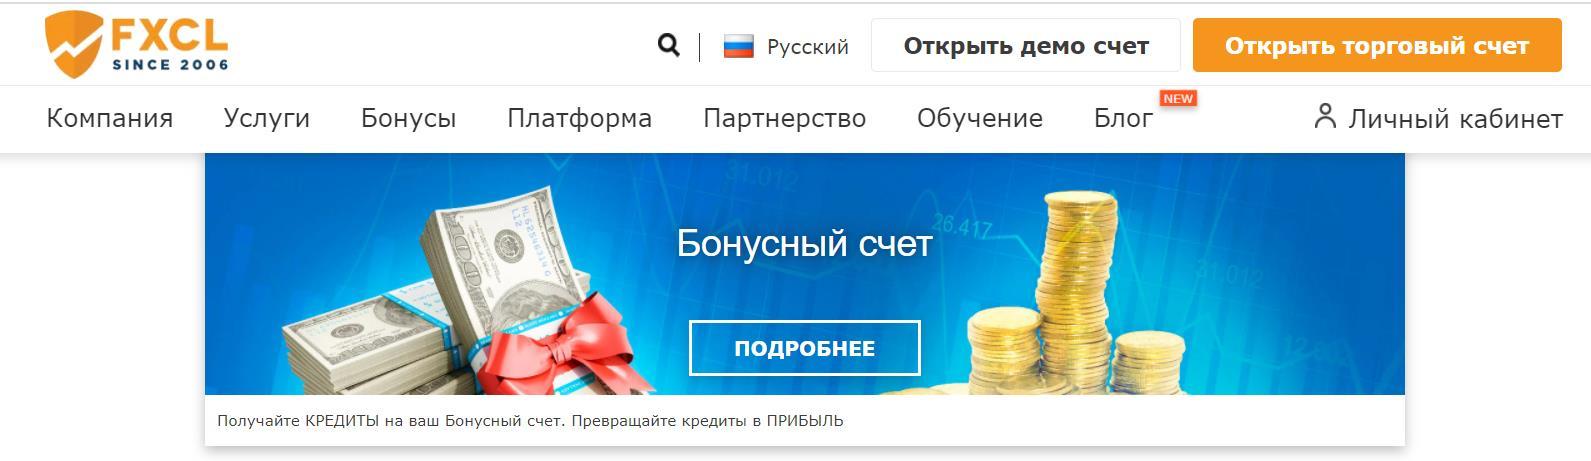 fxcl markets бонусный счет